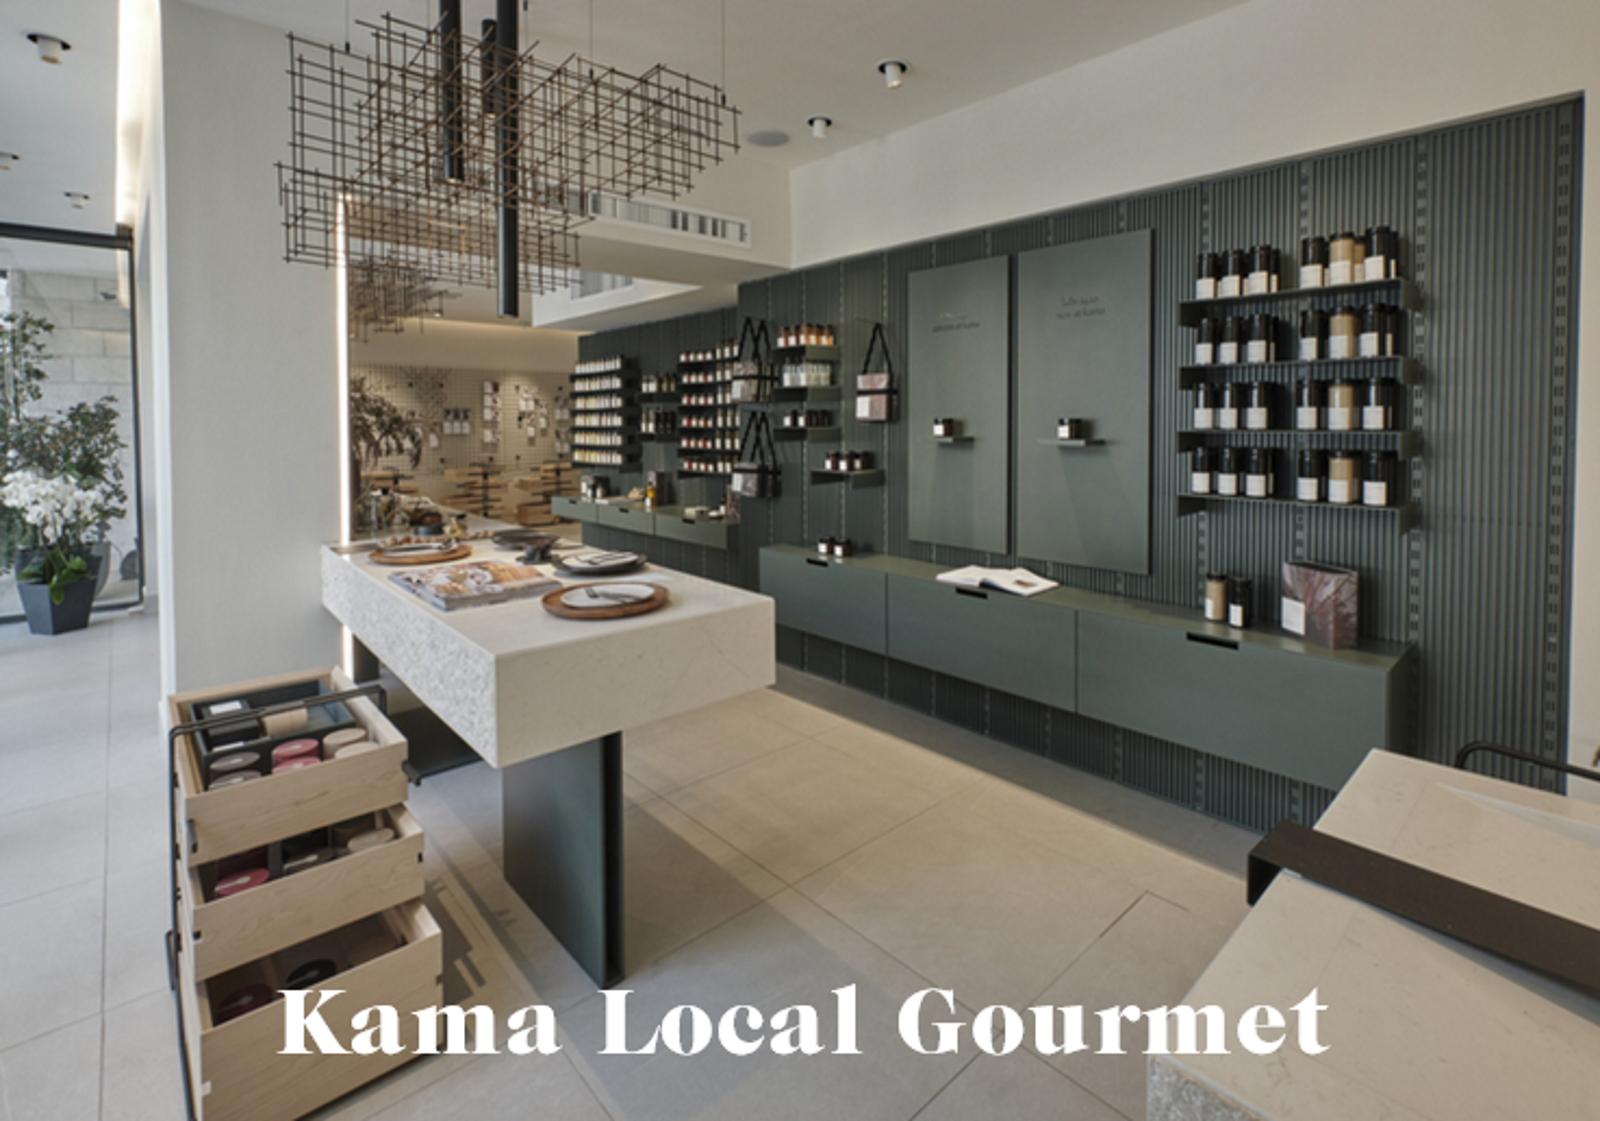 KAMA FOOD RETAIL TOUR MISSIONS MMM